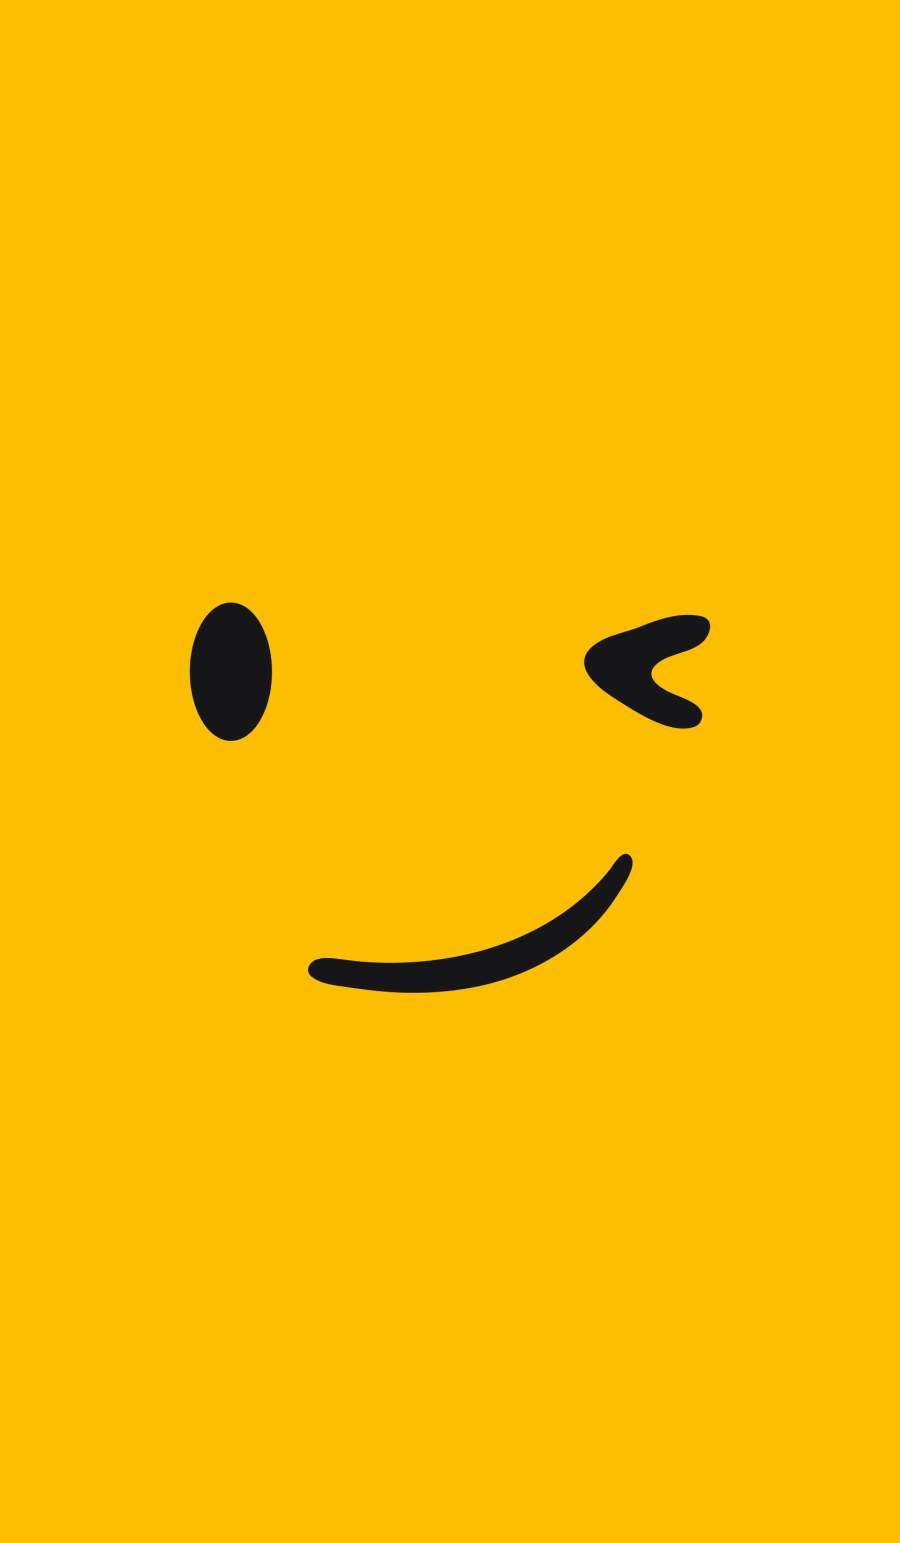 Smile Emoji iPhone Wallpaper